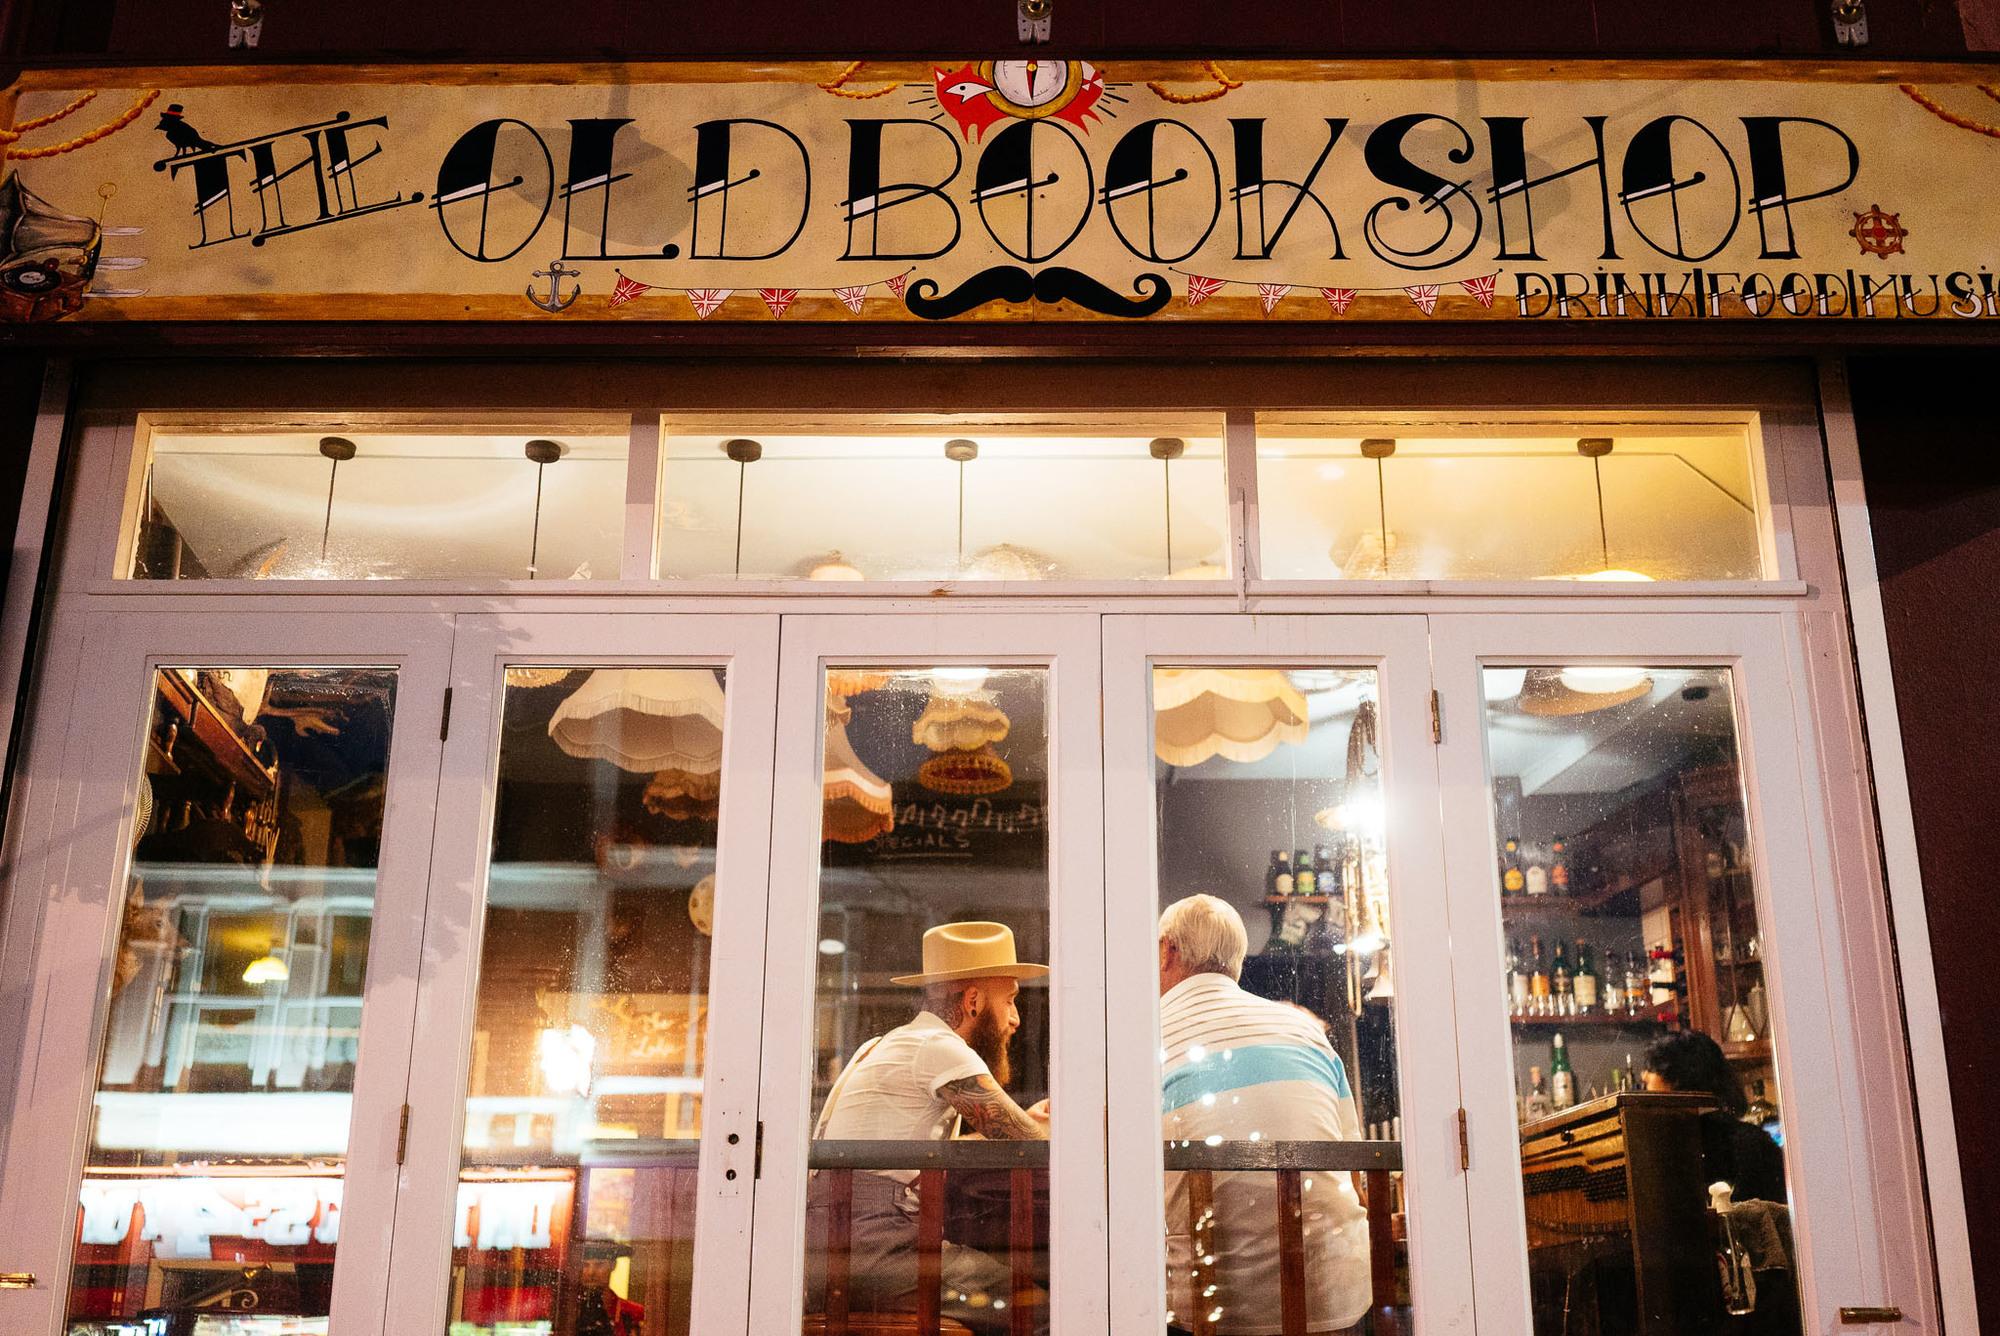 Citinerary Bristol Old Bookshop